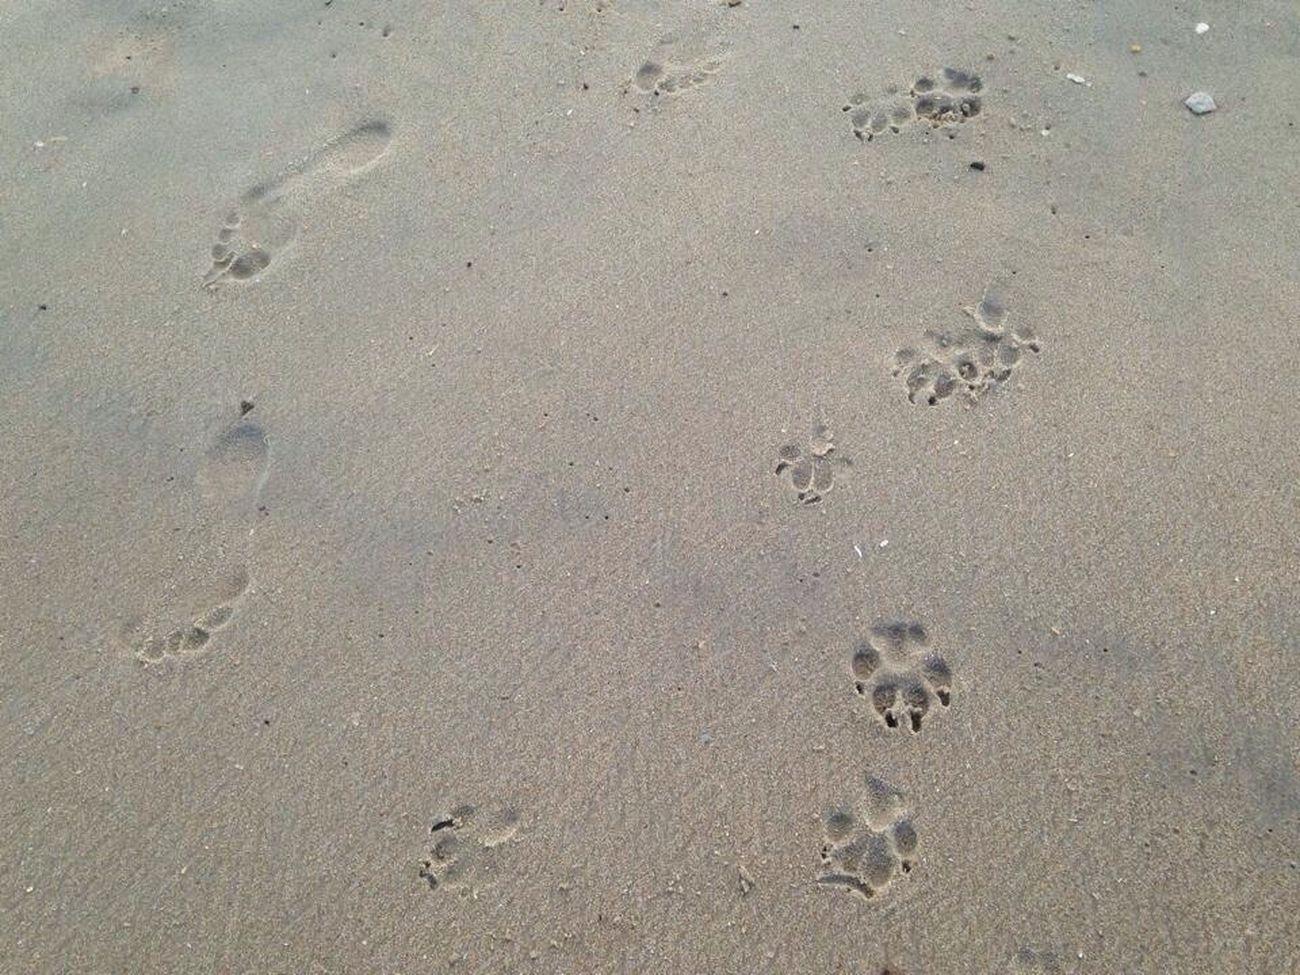 Always by my side. Bffs Love My Dog  Dogs Allowed OBX14